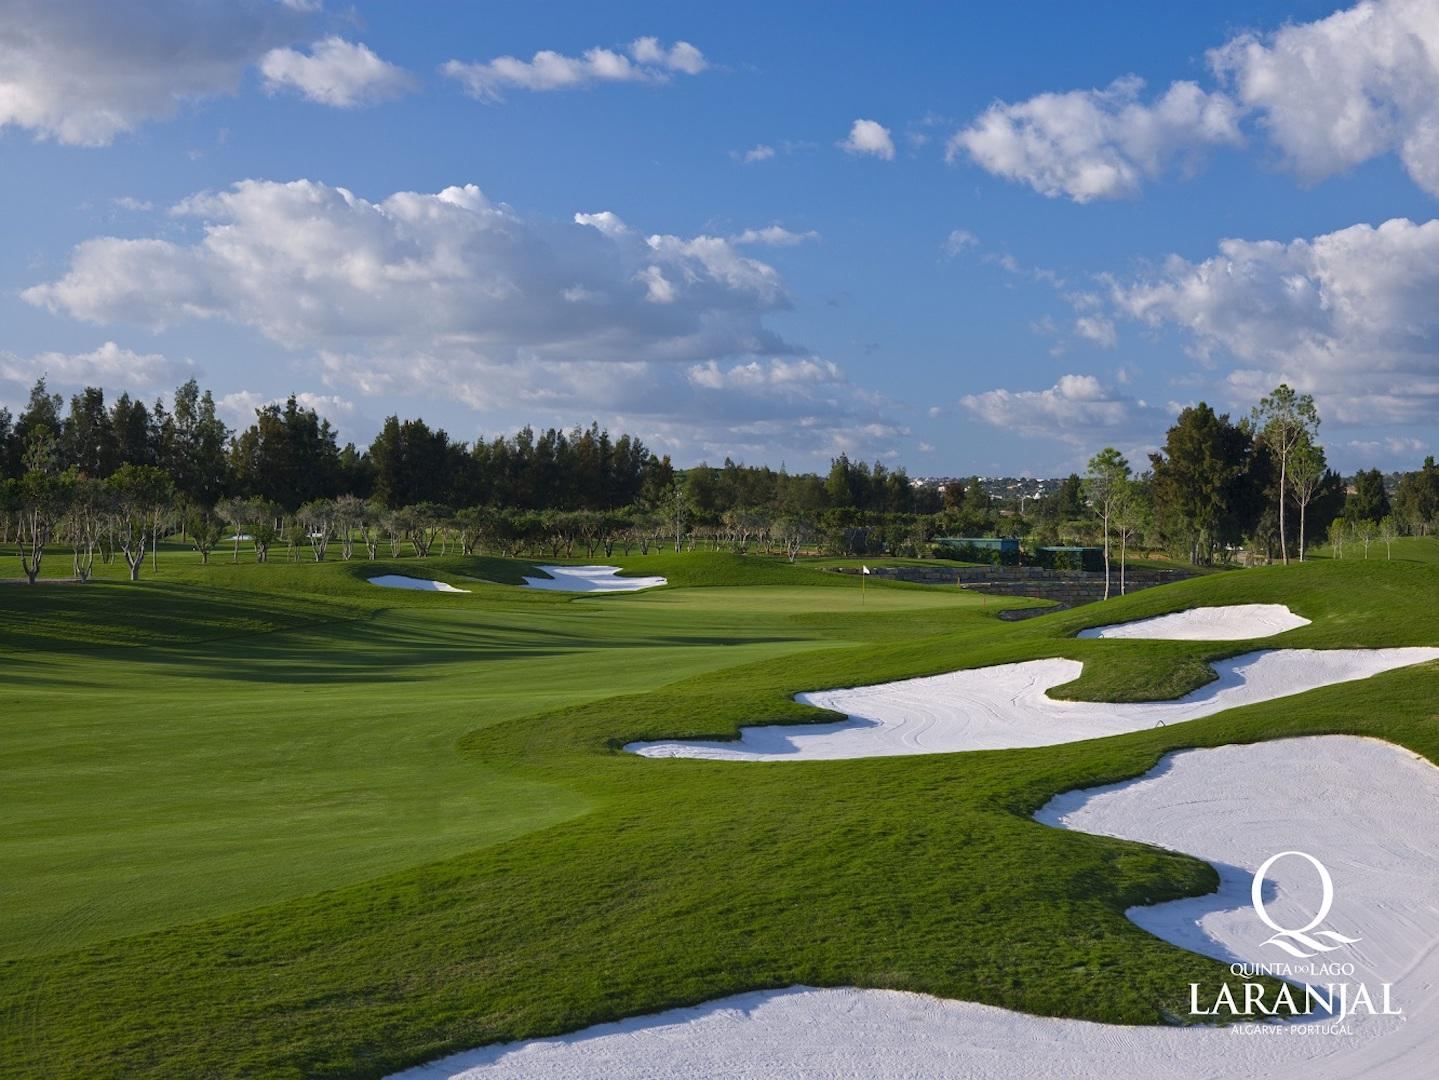 Quinta do Lago strengthens support for junior golf